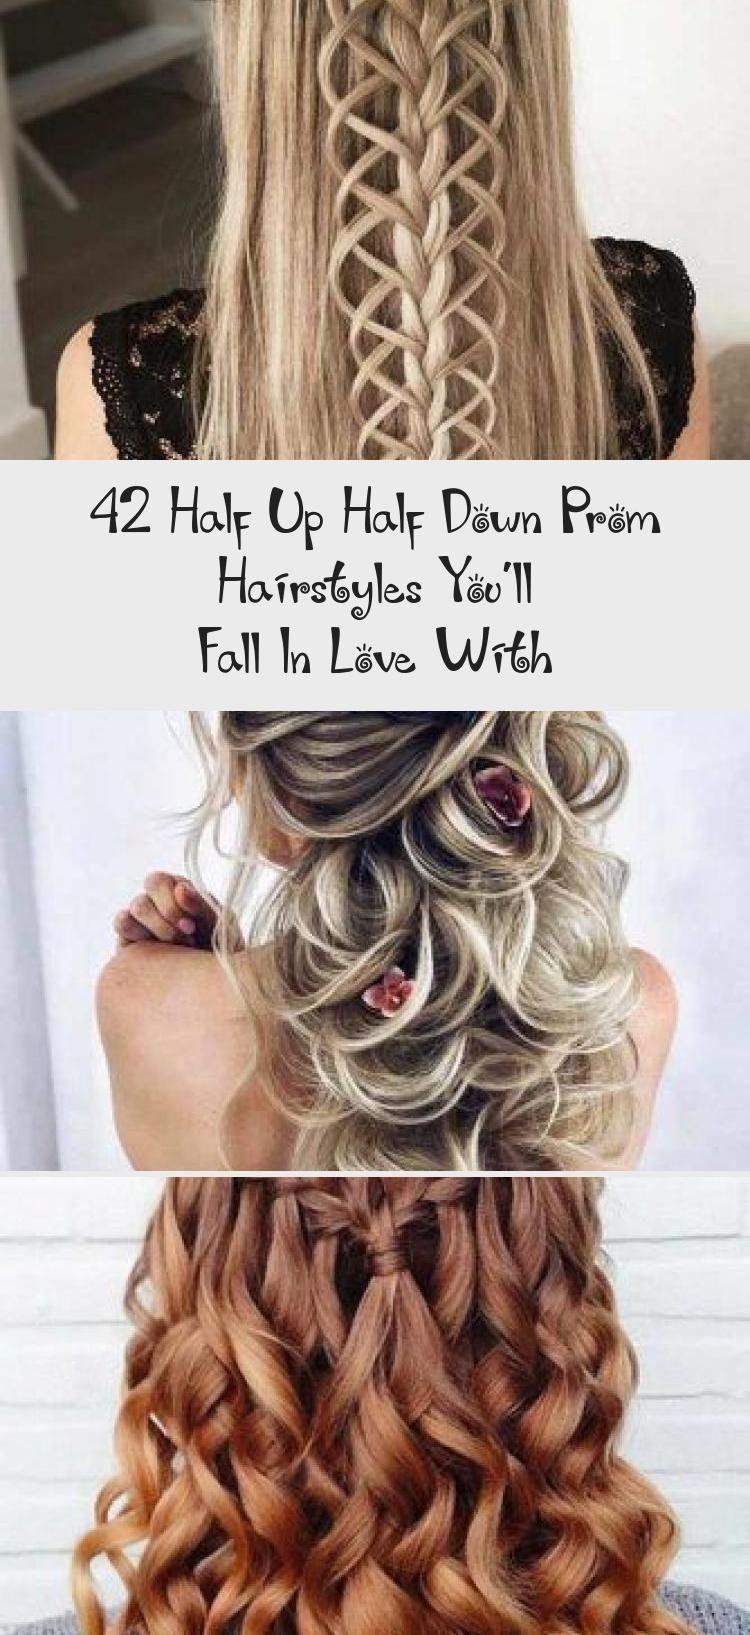 15+ Promo coiffure inspiration